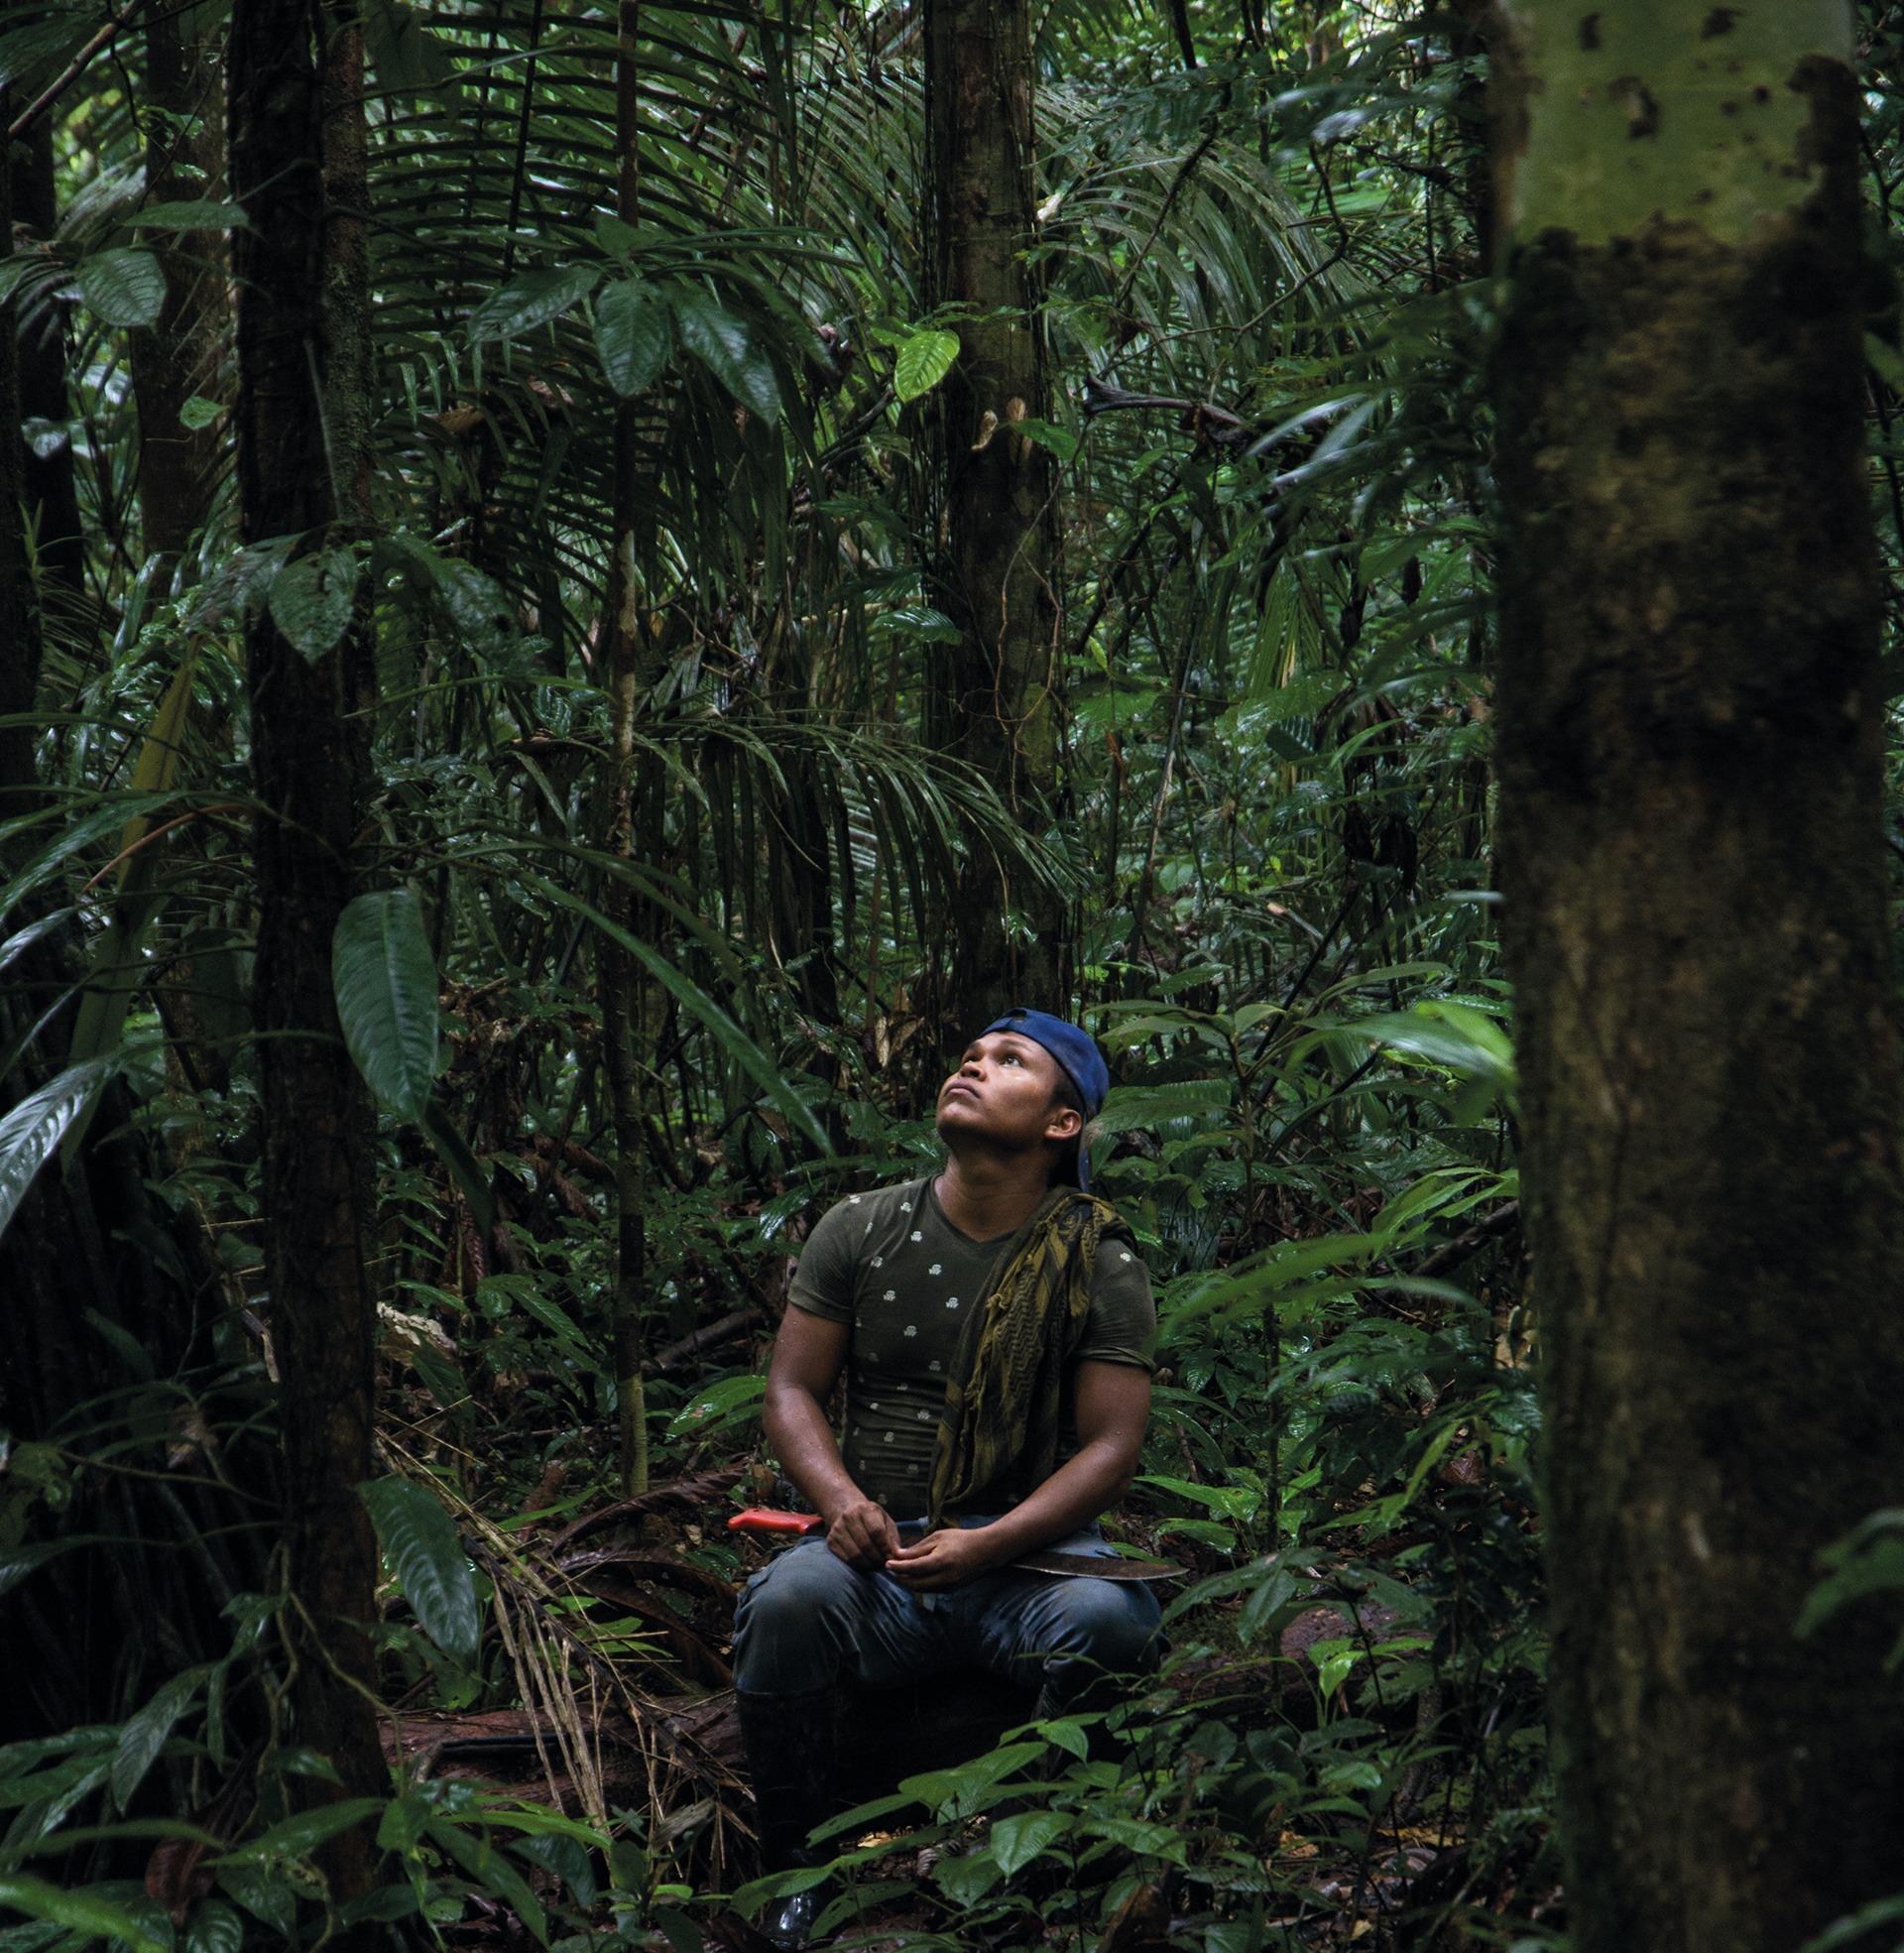 Amazonie - Lila Akal - Bouts du monde